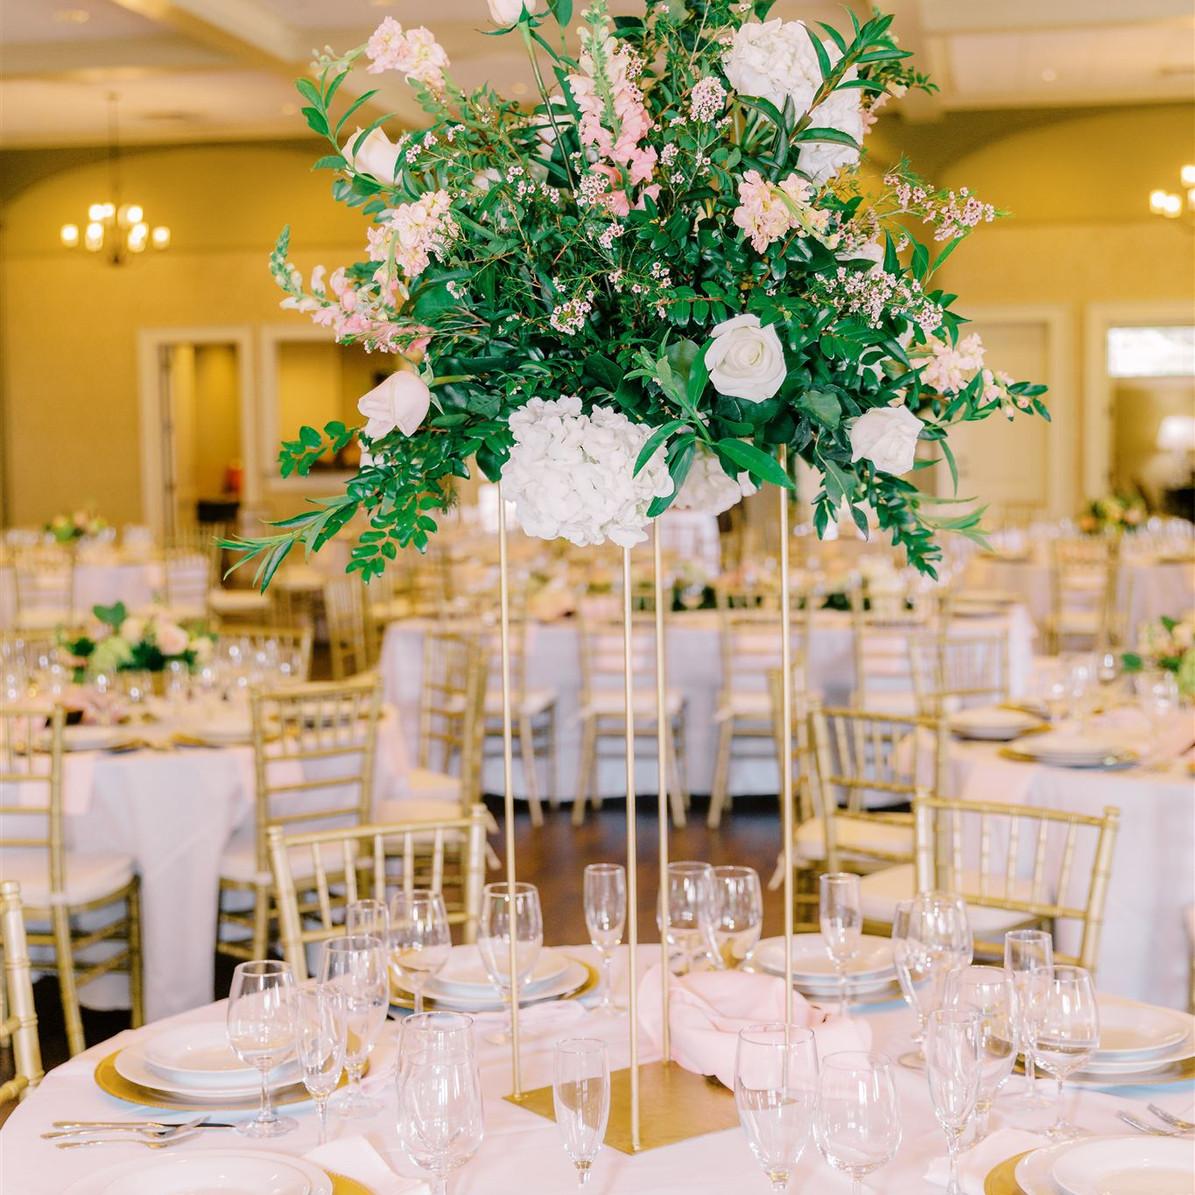 AisPortraits-Kate-Mitch-Wedding-22_websize.jpg